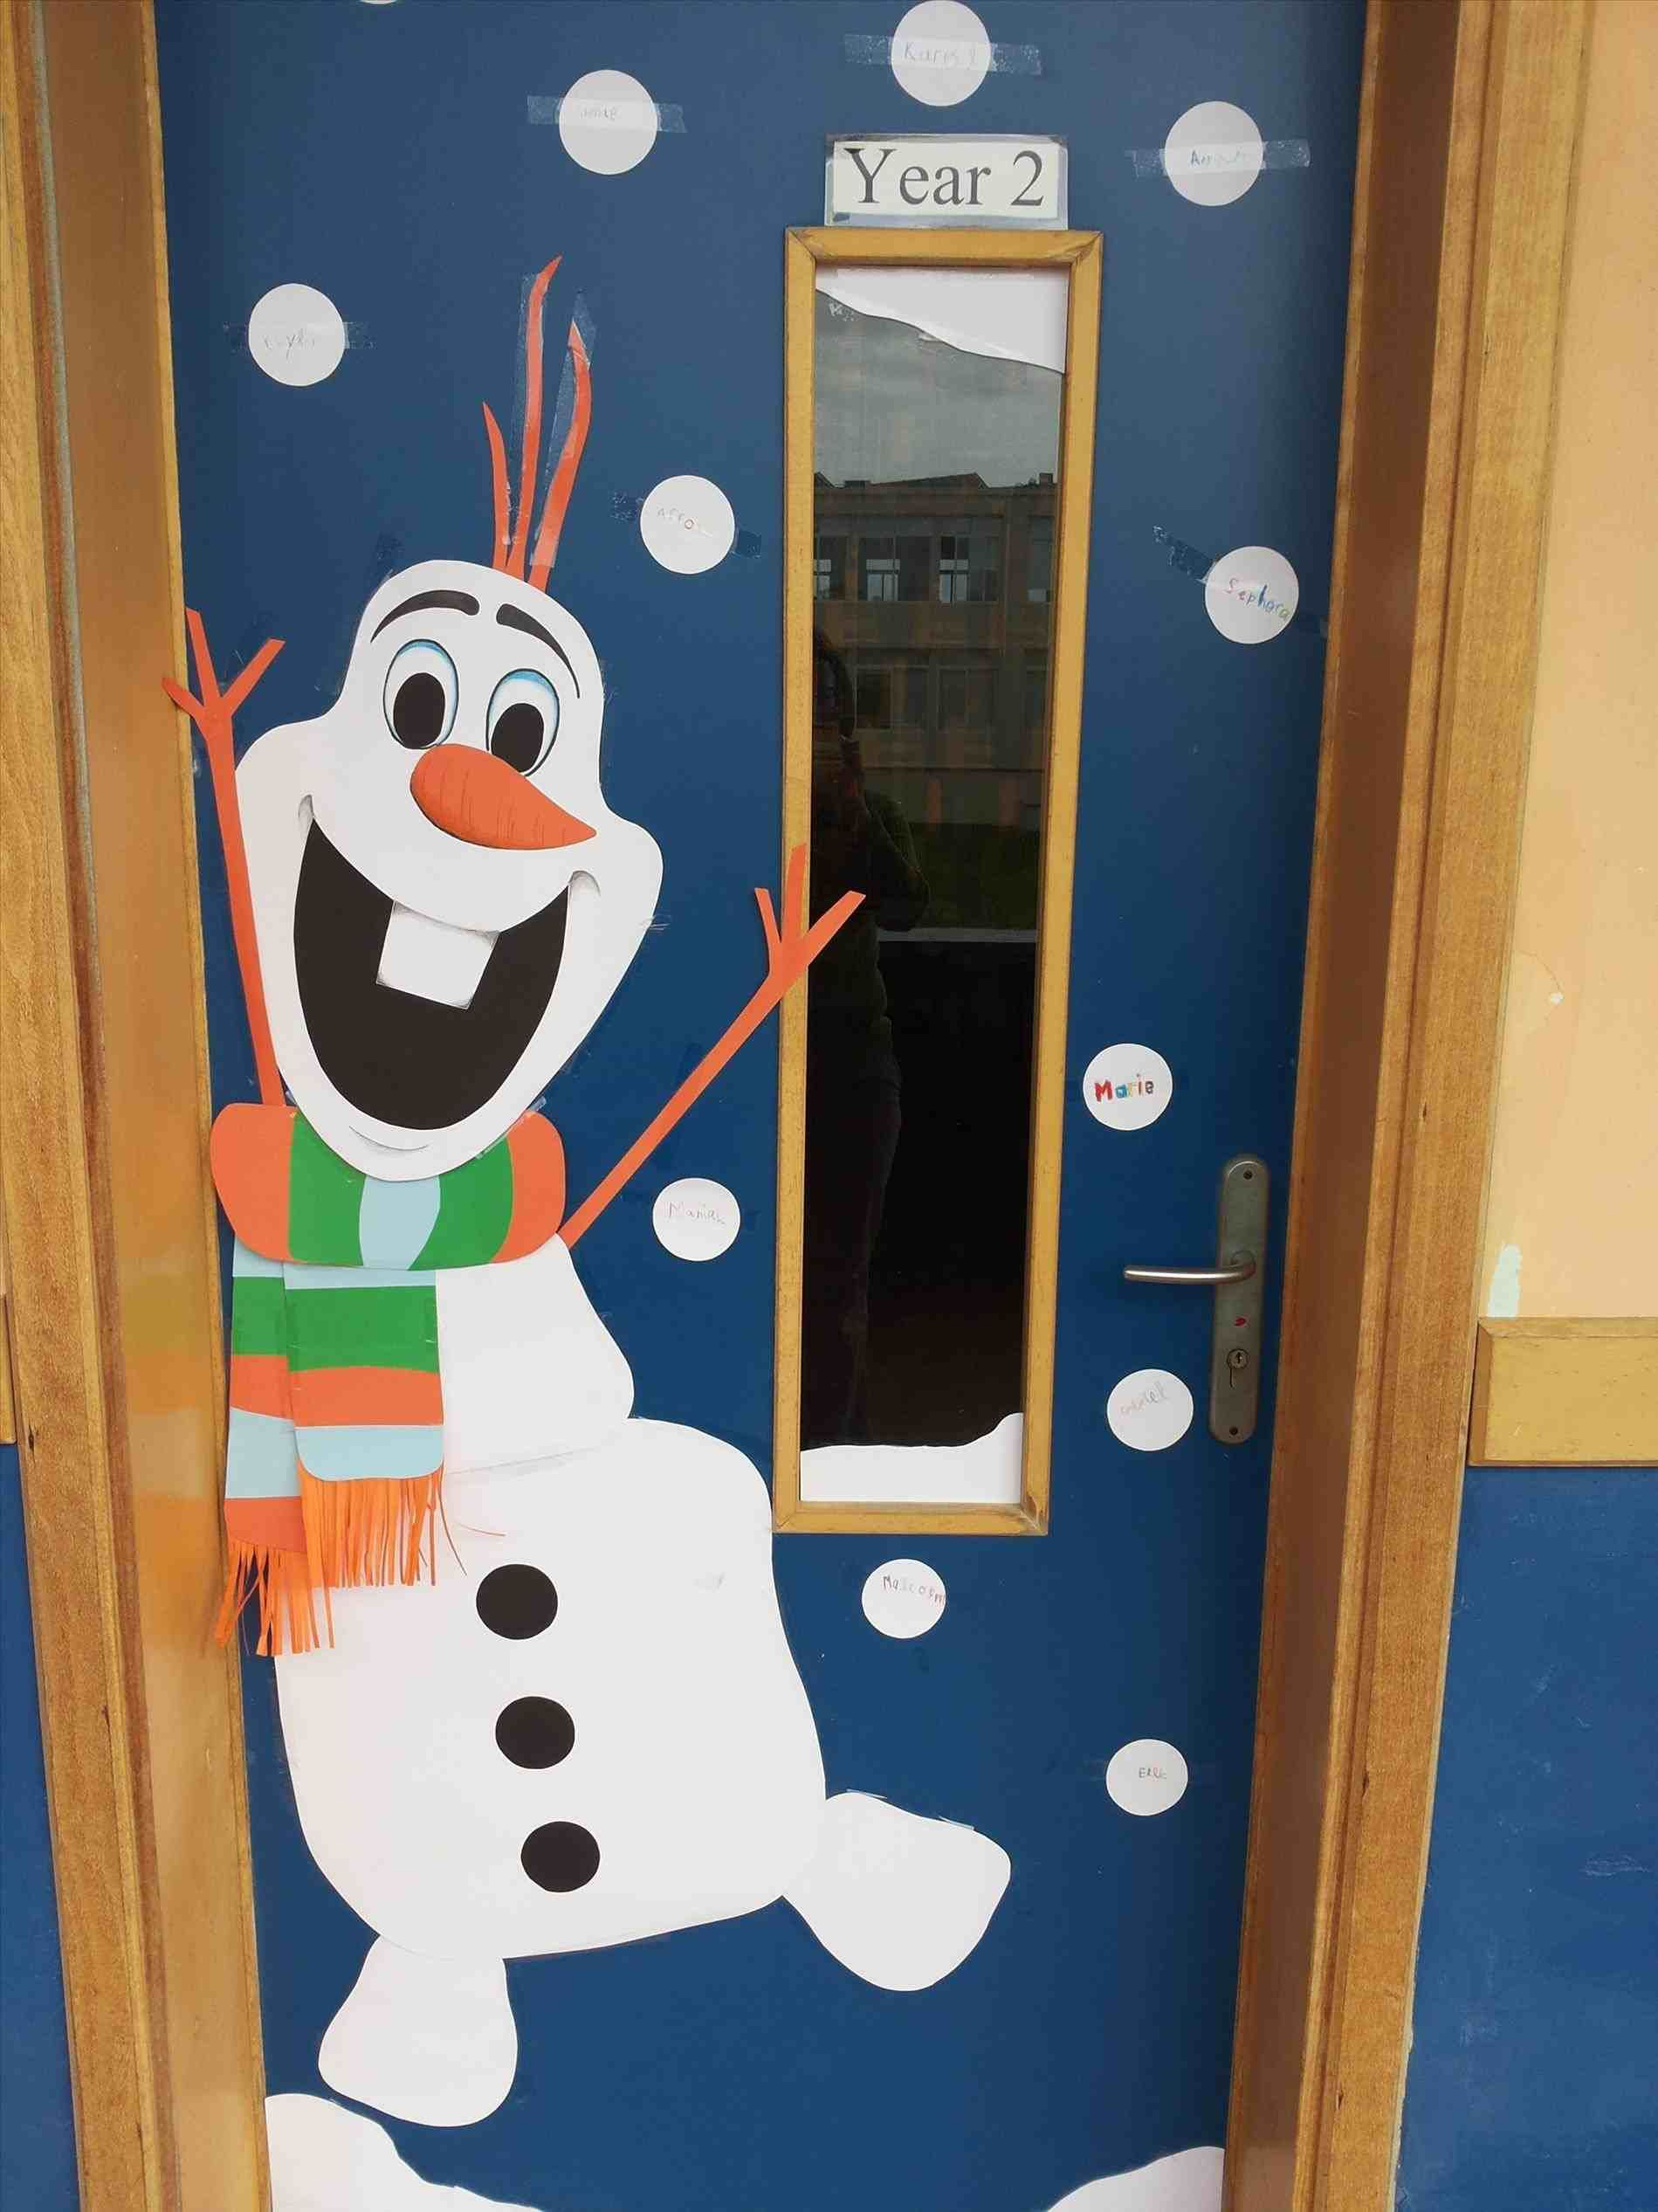 Classroom Door Decoration Ideas For Kindergarten Classroom Christmas Decorations Door Decorations Classroom Christmas Christmas Classroom Door